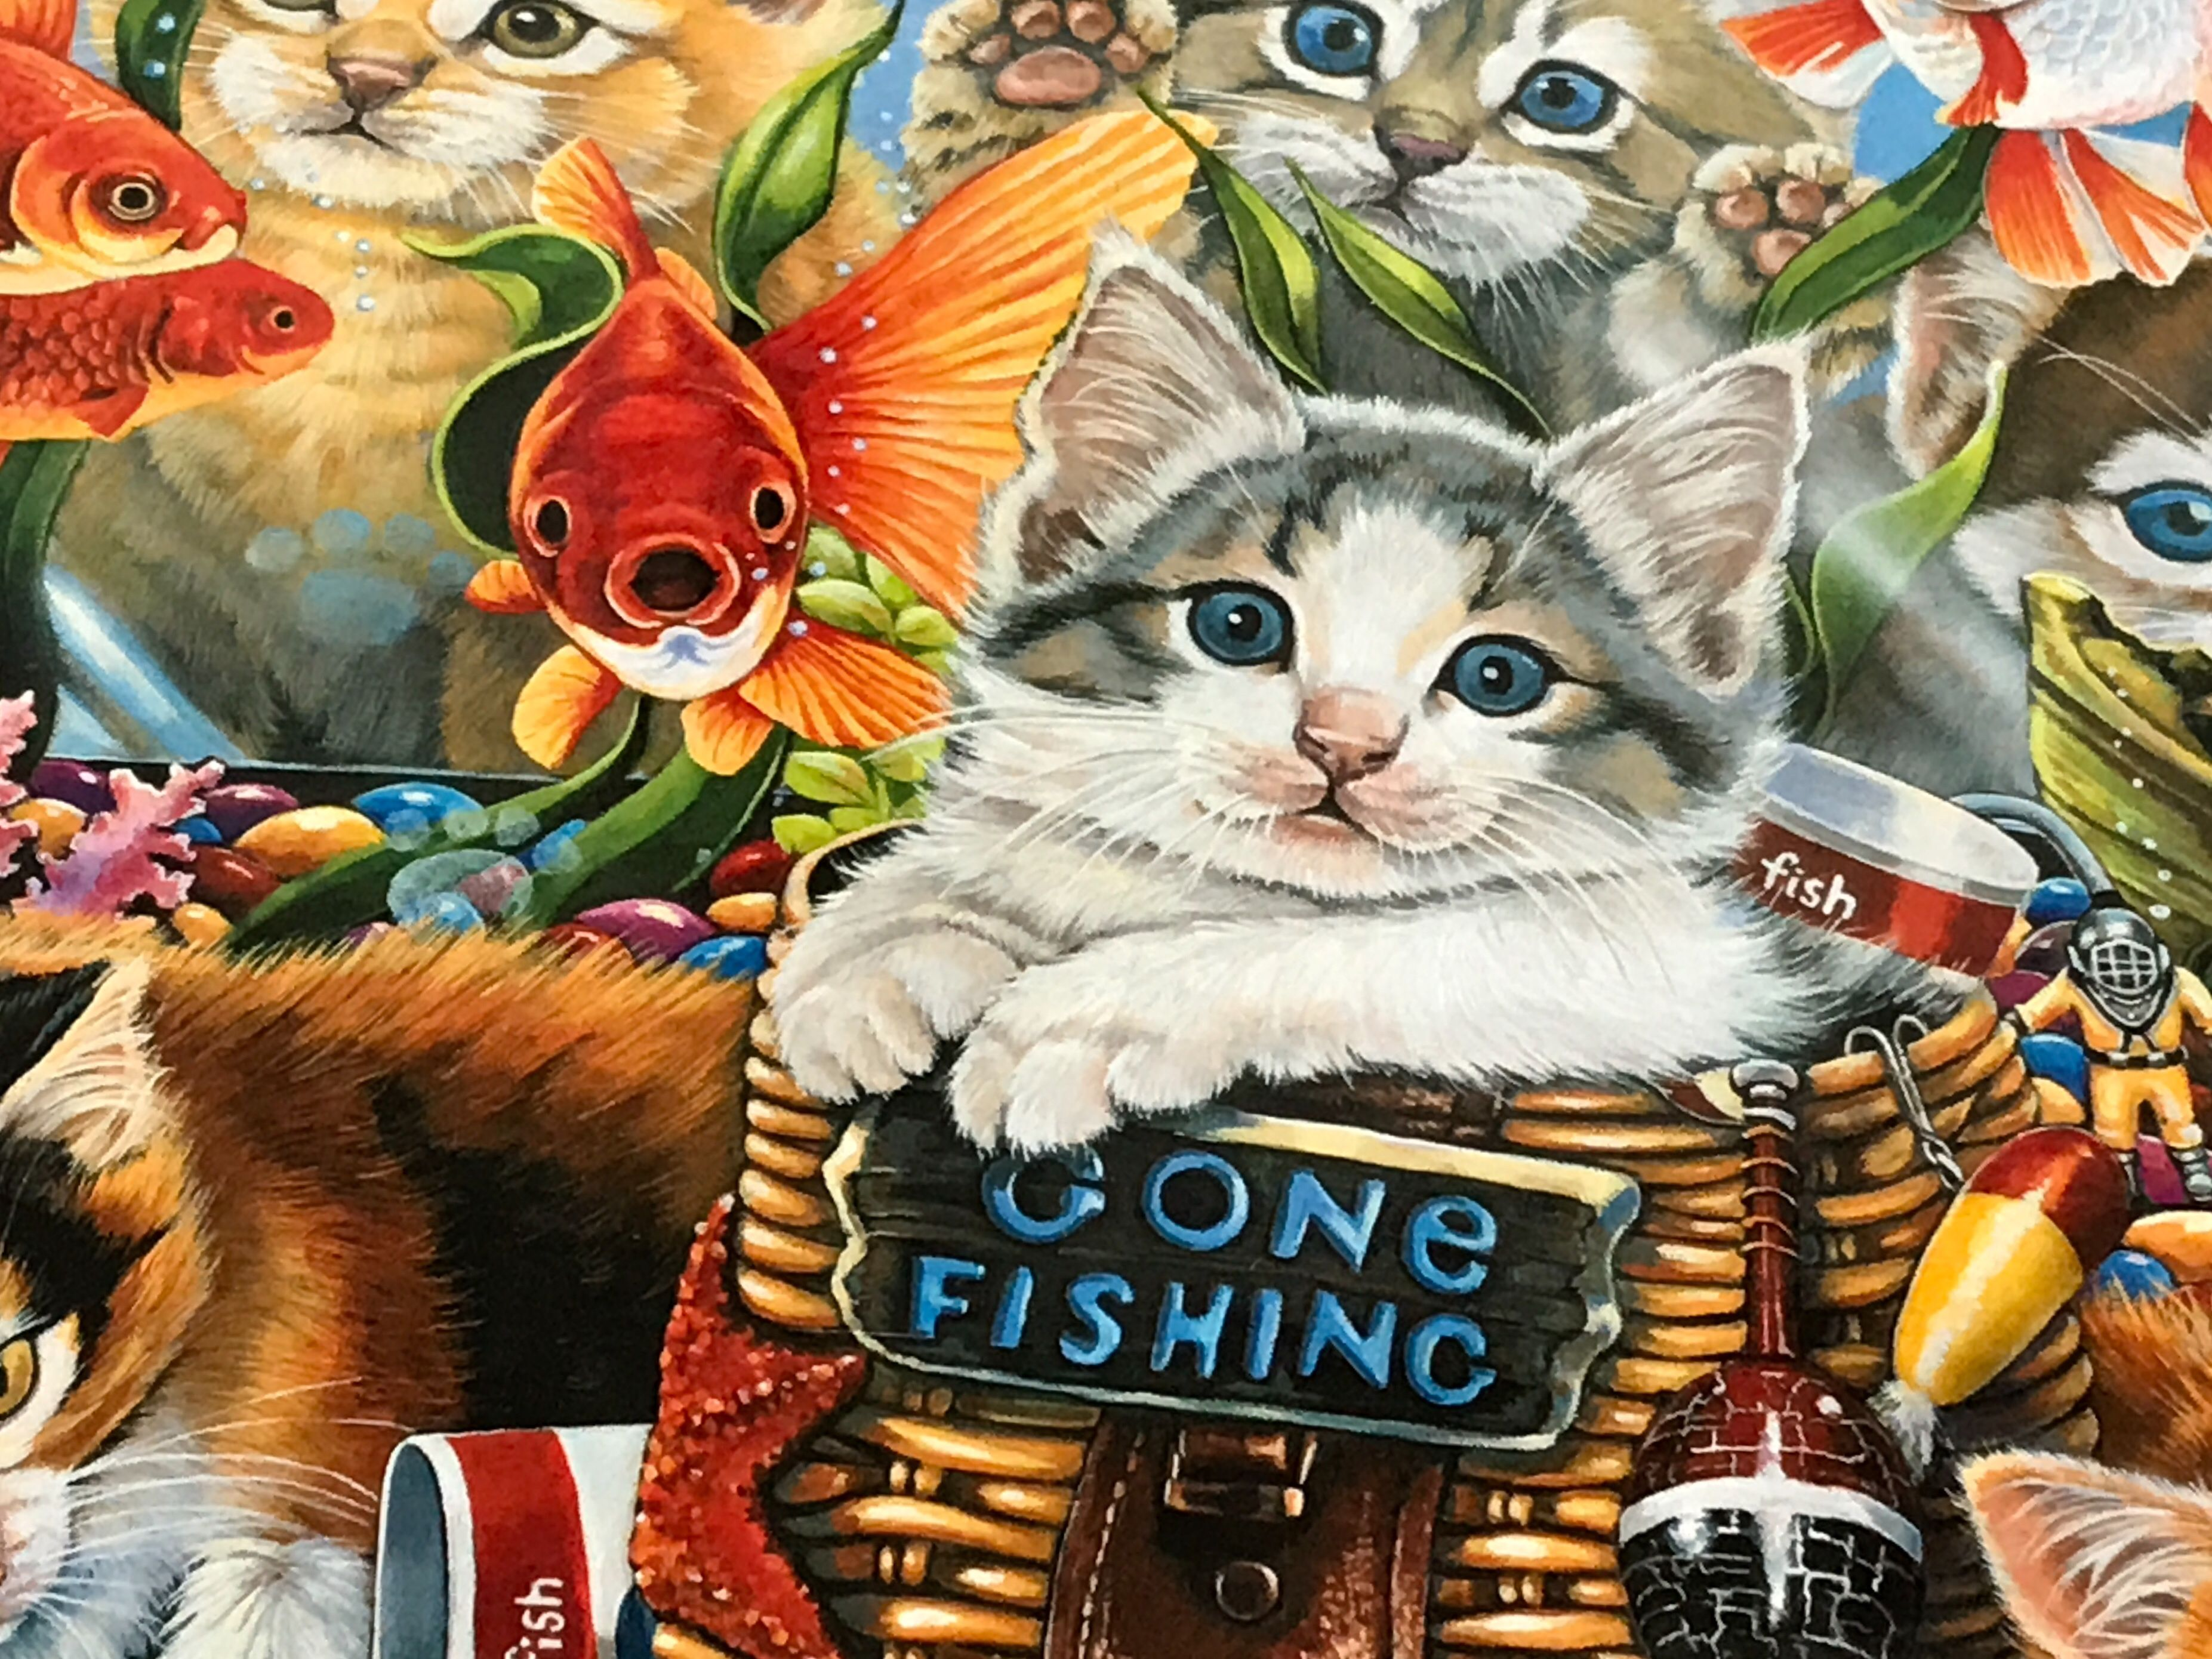 Gone Fishing 550 | Gone fishing, Fish, Puzzles